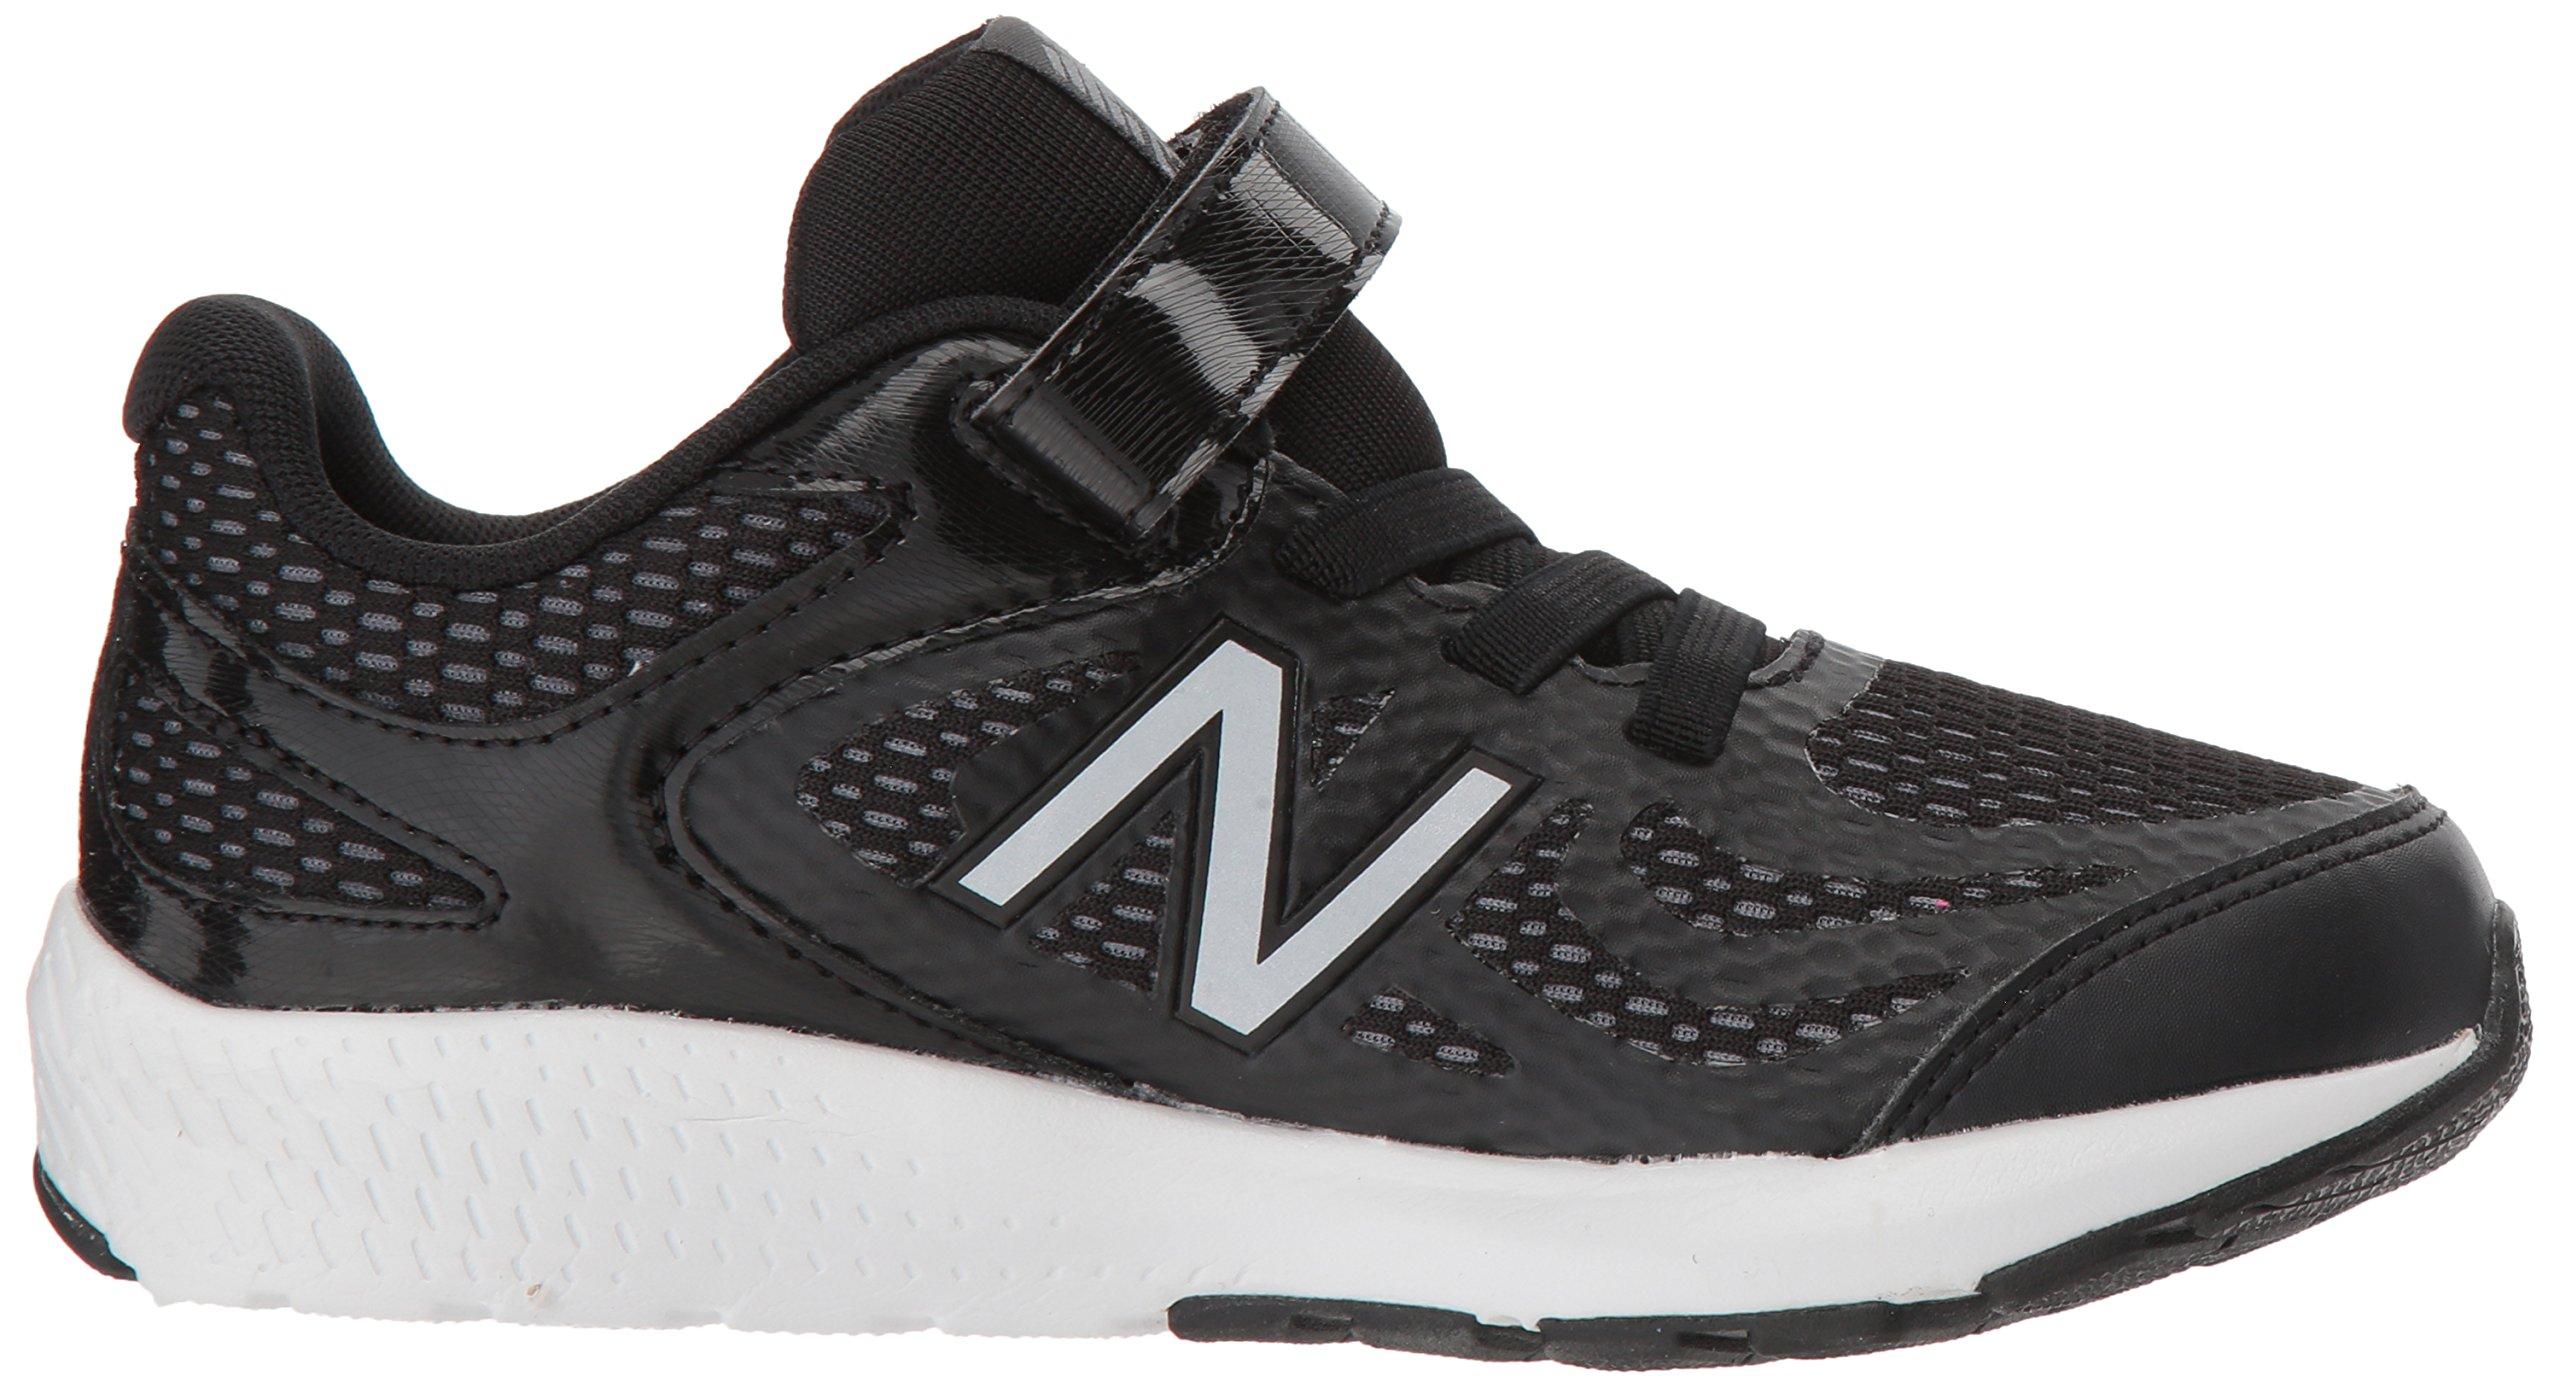 New Balance Boys' 519v1 Hook and Loop Running Shoe Black/White 2 M US Infant by New Balance (Image #7)